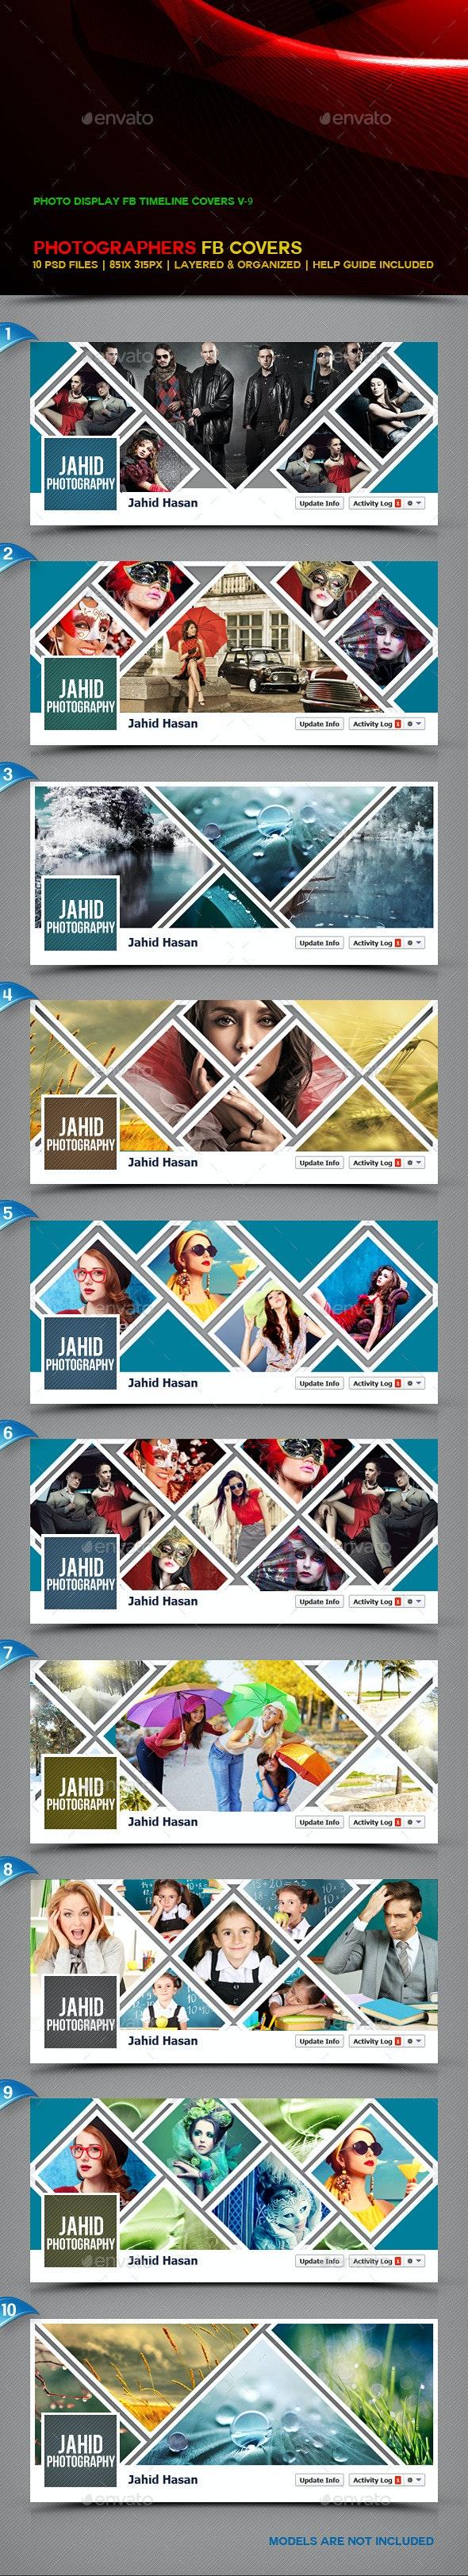 Photo Display FB Timeline Covers V9 - Facebook Timeline Covers Social Media